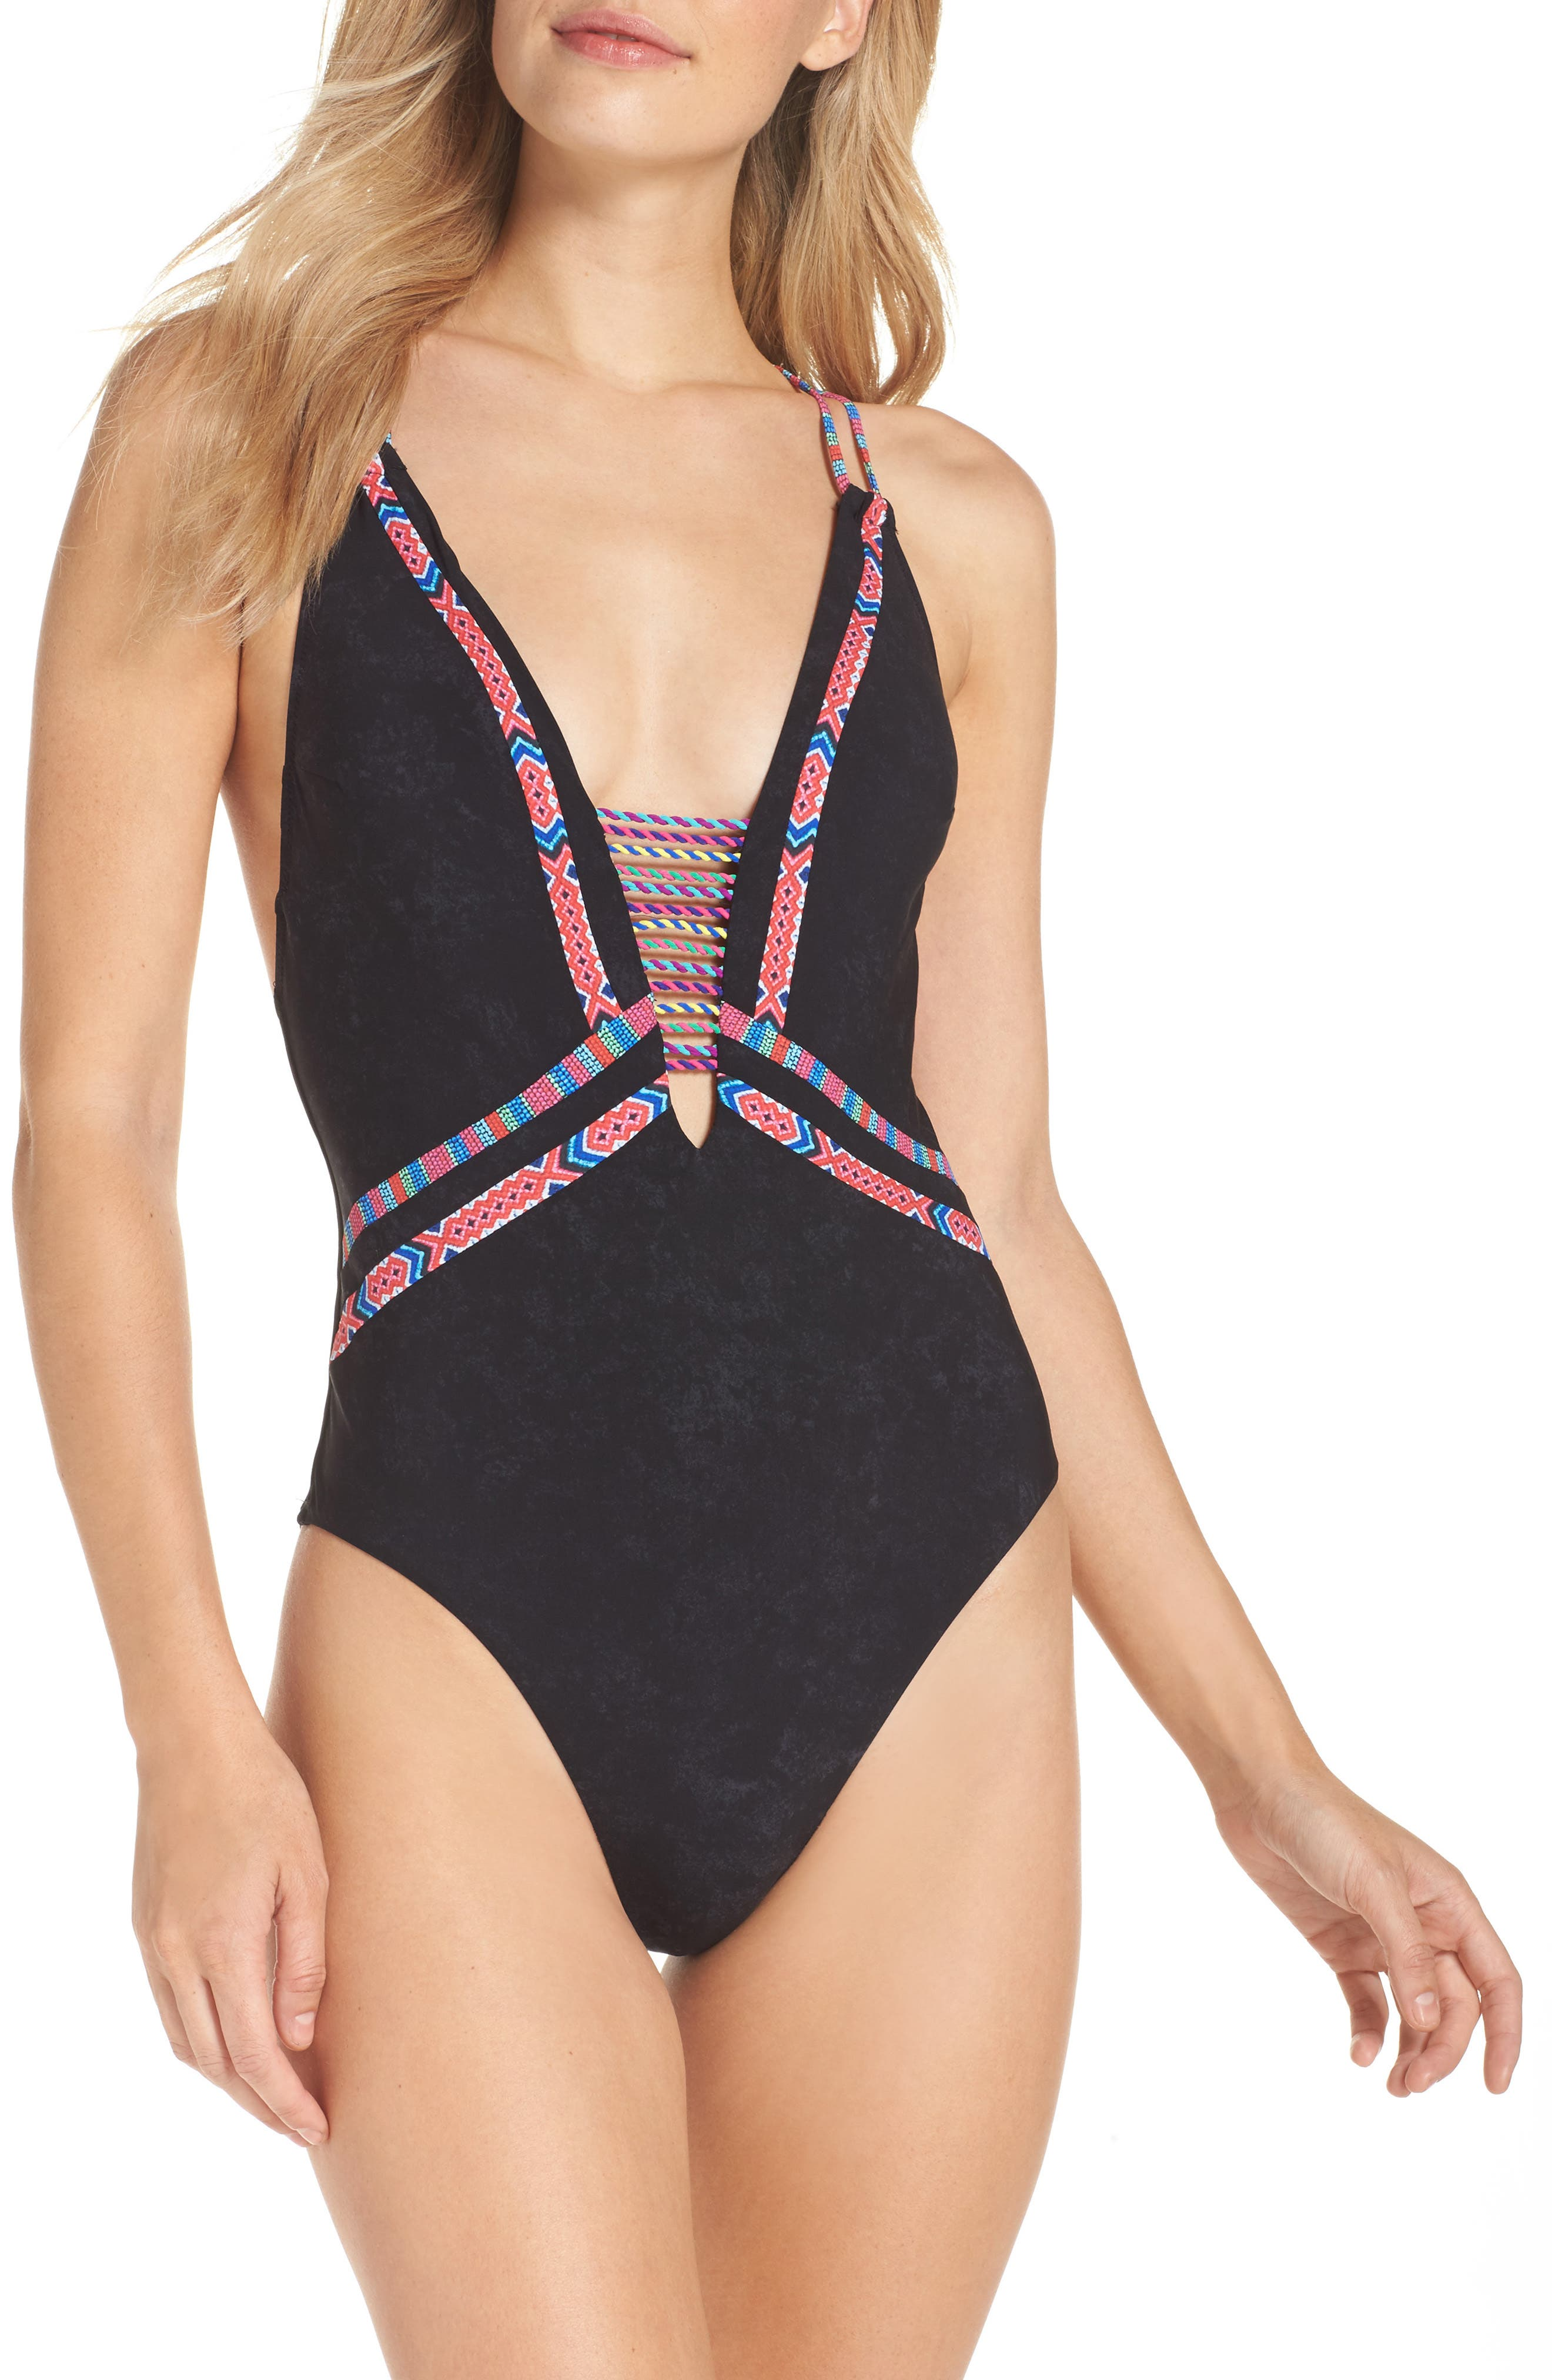 Alternate Image 1 Selected - Nanette Lepore Cha Cha Cha Goddess One-Piece Swimsuit